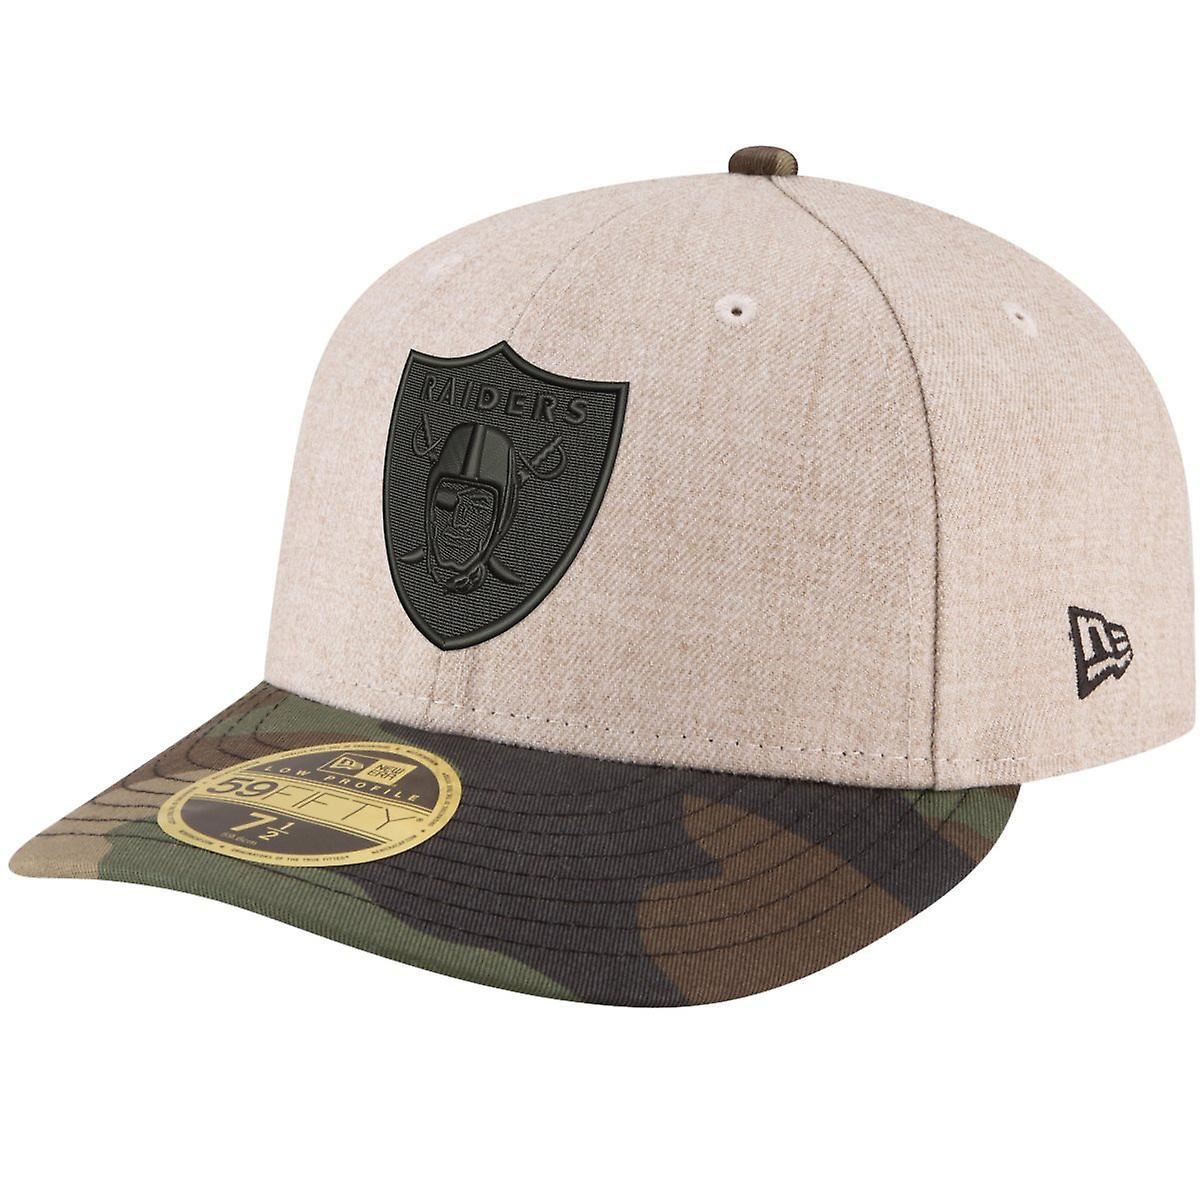 Oakland Raiders wood camo New Era 59Fifty LOW PROFILE Cap